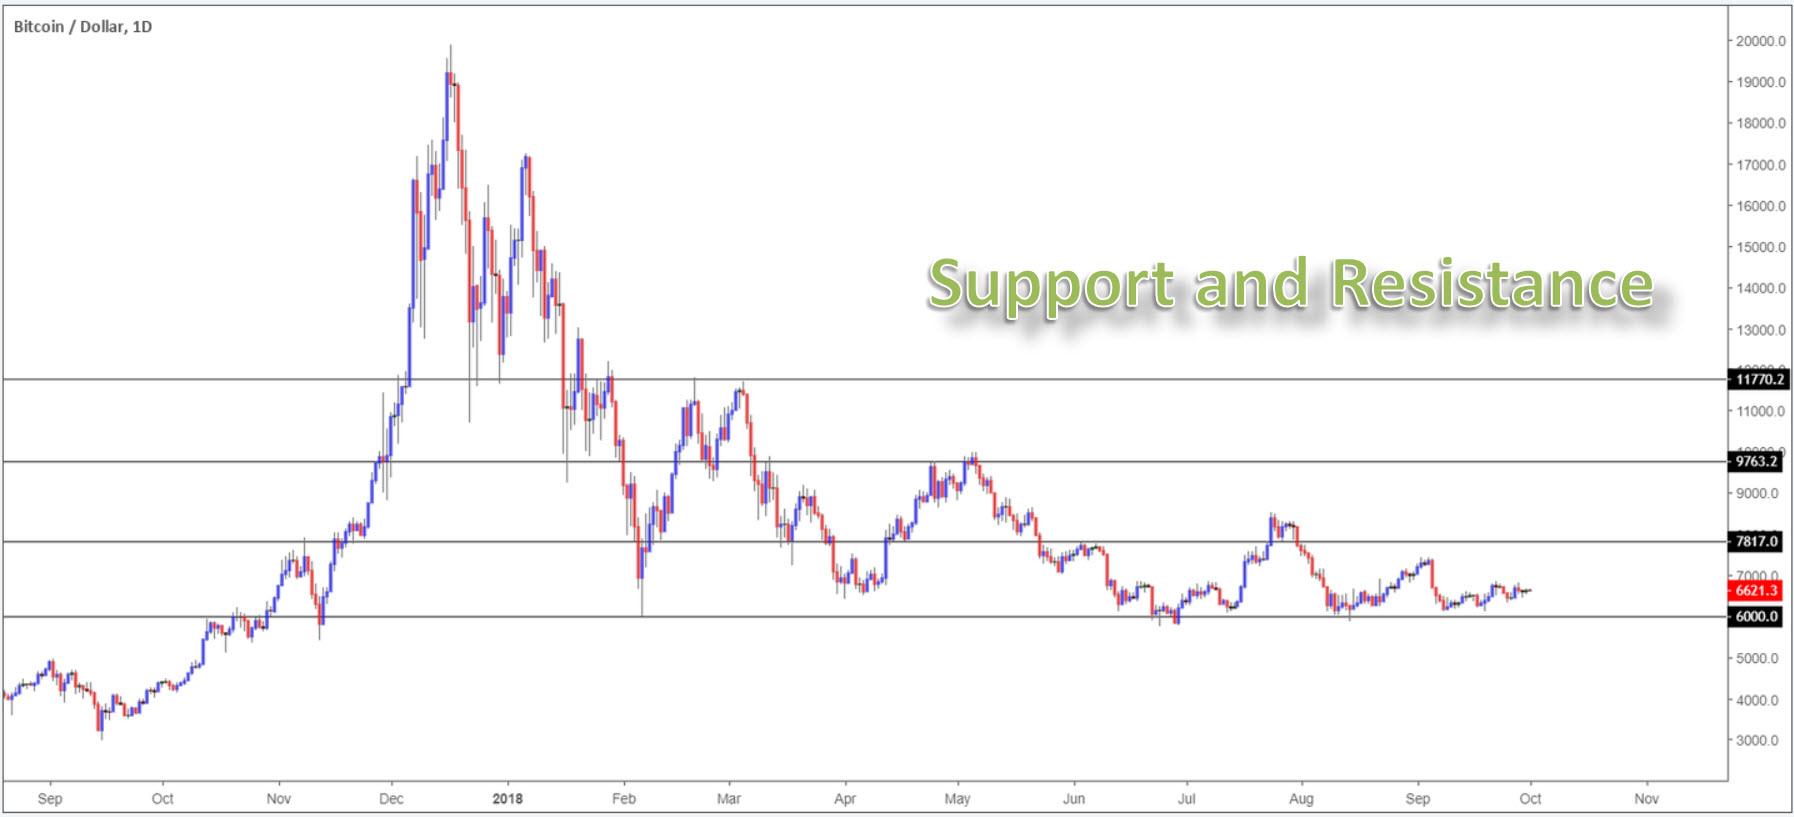 How to trade bitcoin 4